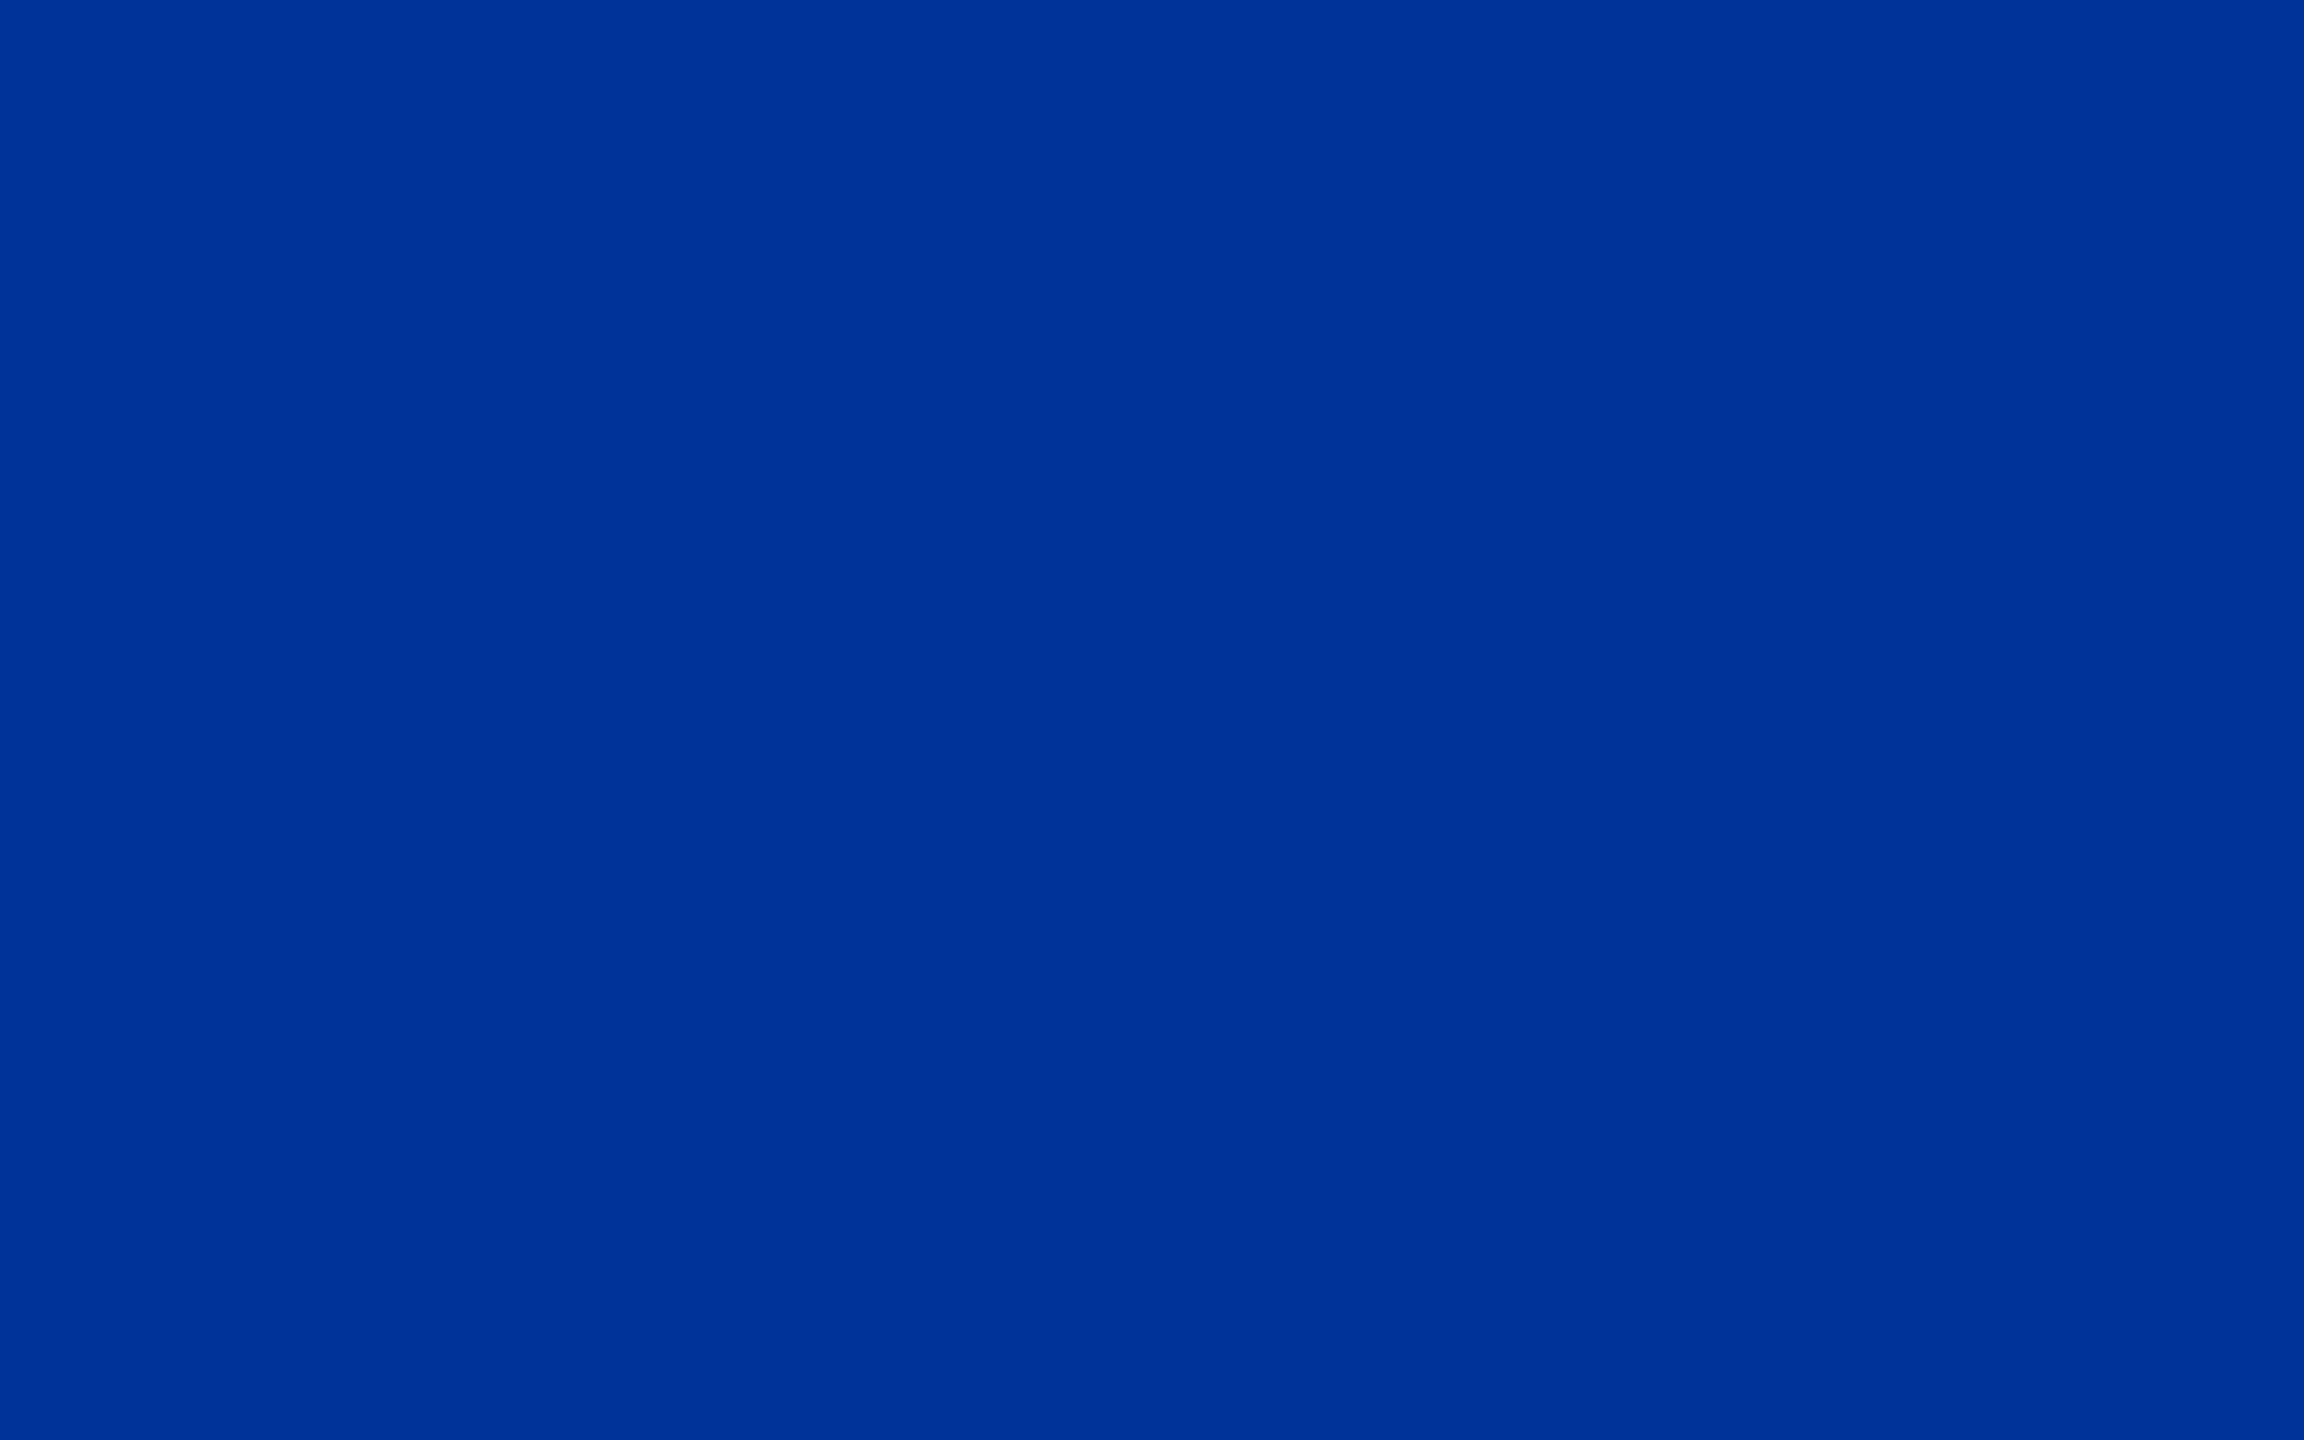 2304x1440 Dark Powder Blue Solid Color Background